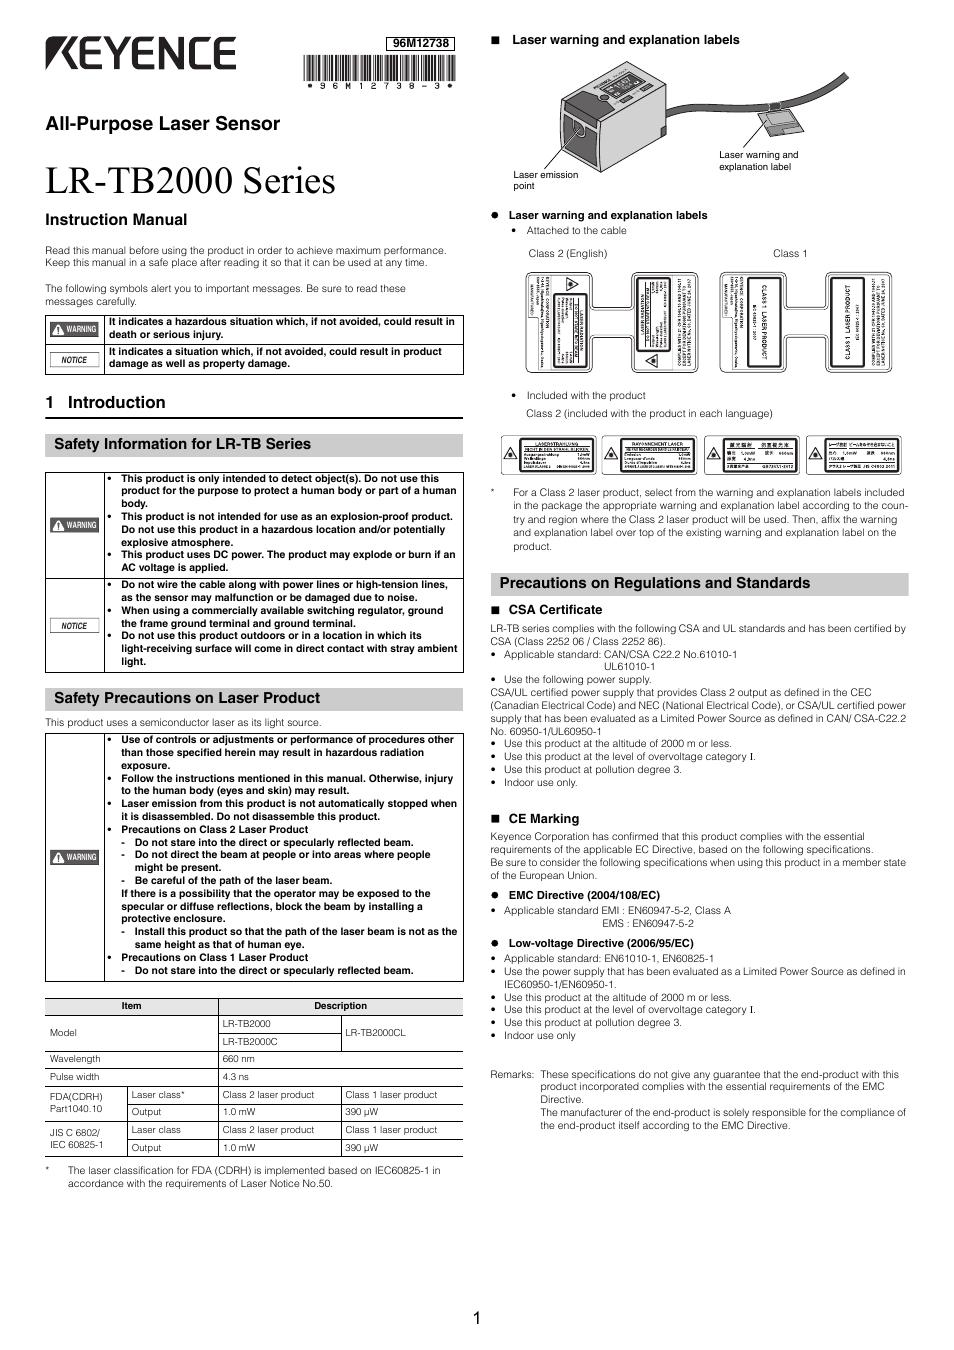 Manual Reset Wiring Diagram Keyence Lr Tb2000 Series User Manual 12 Pages Original